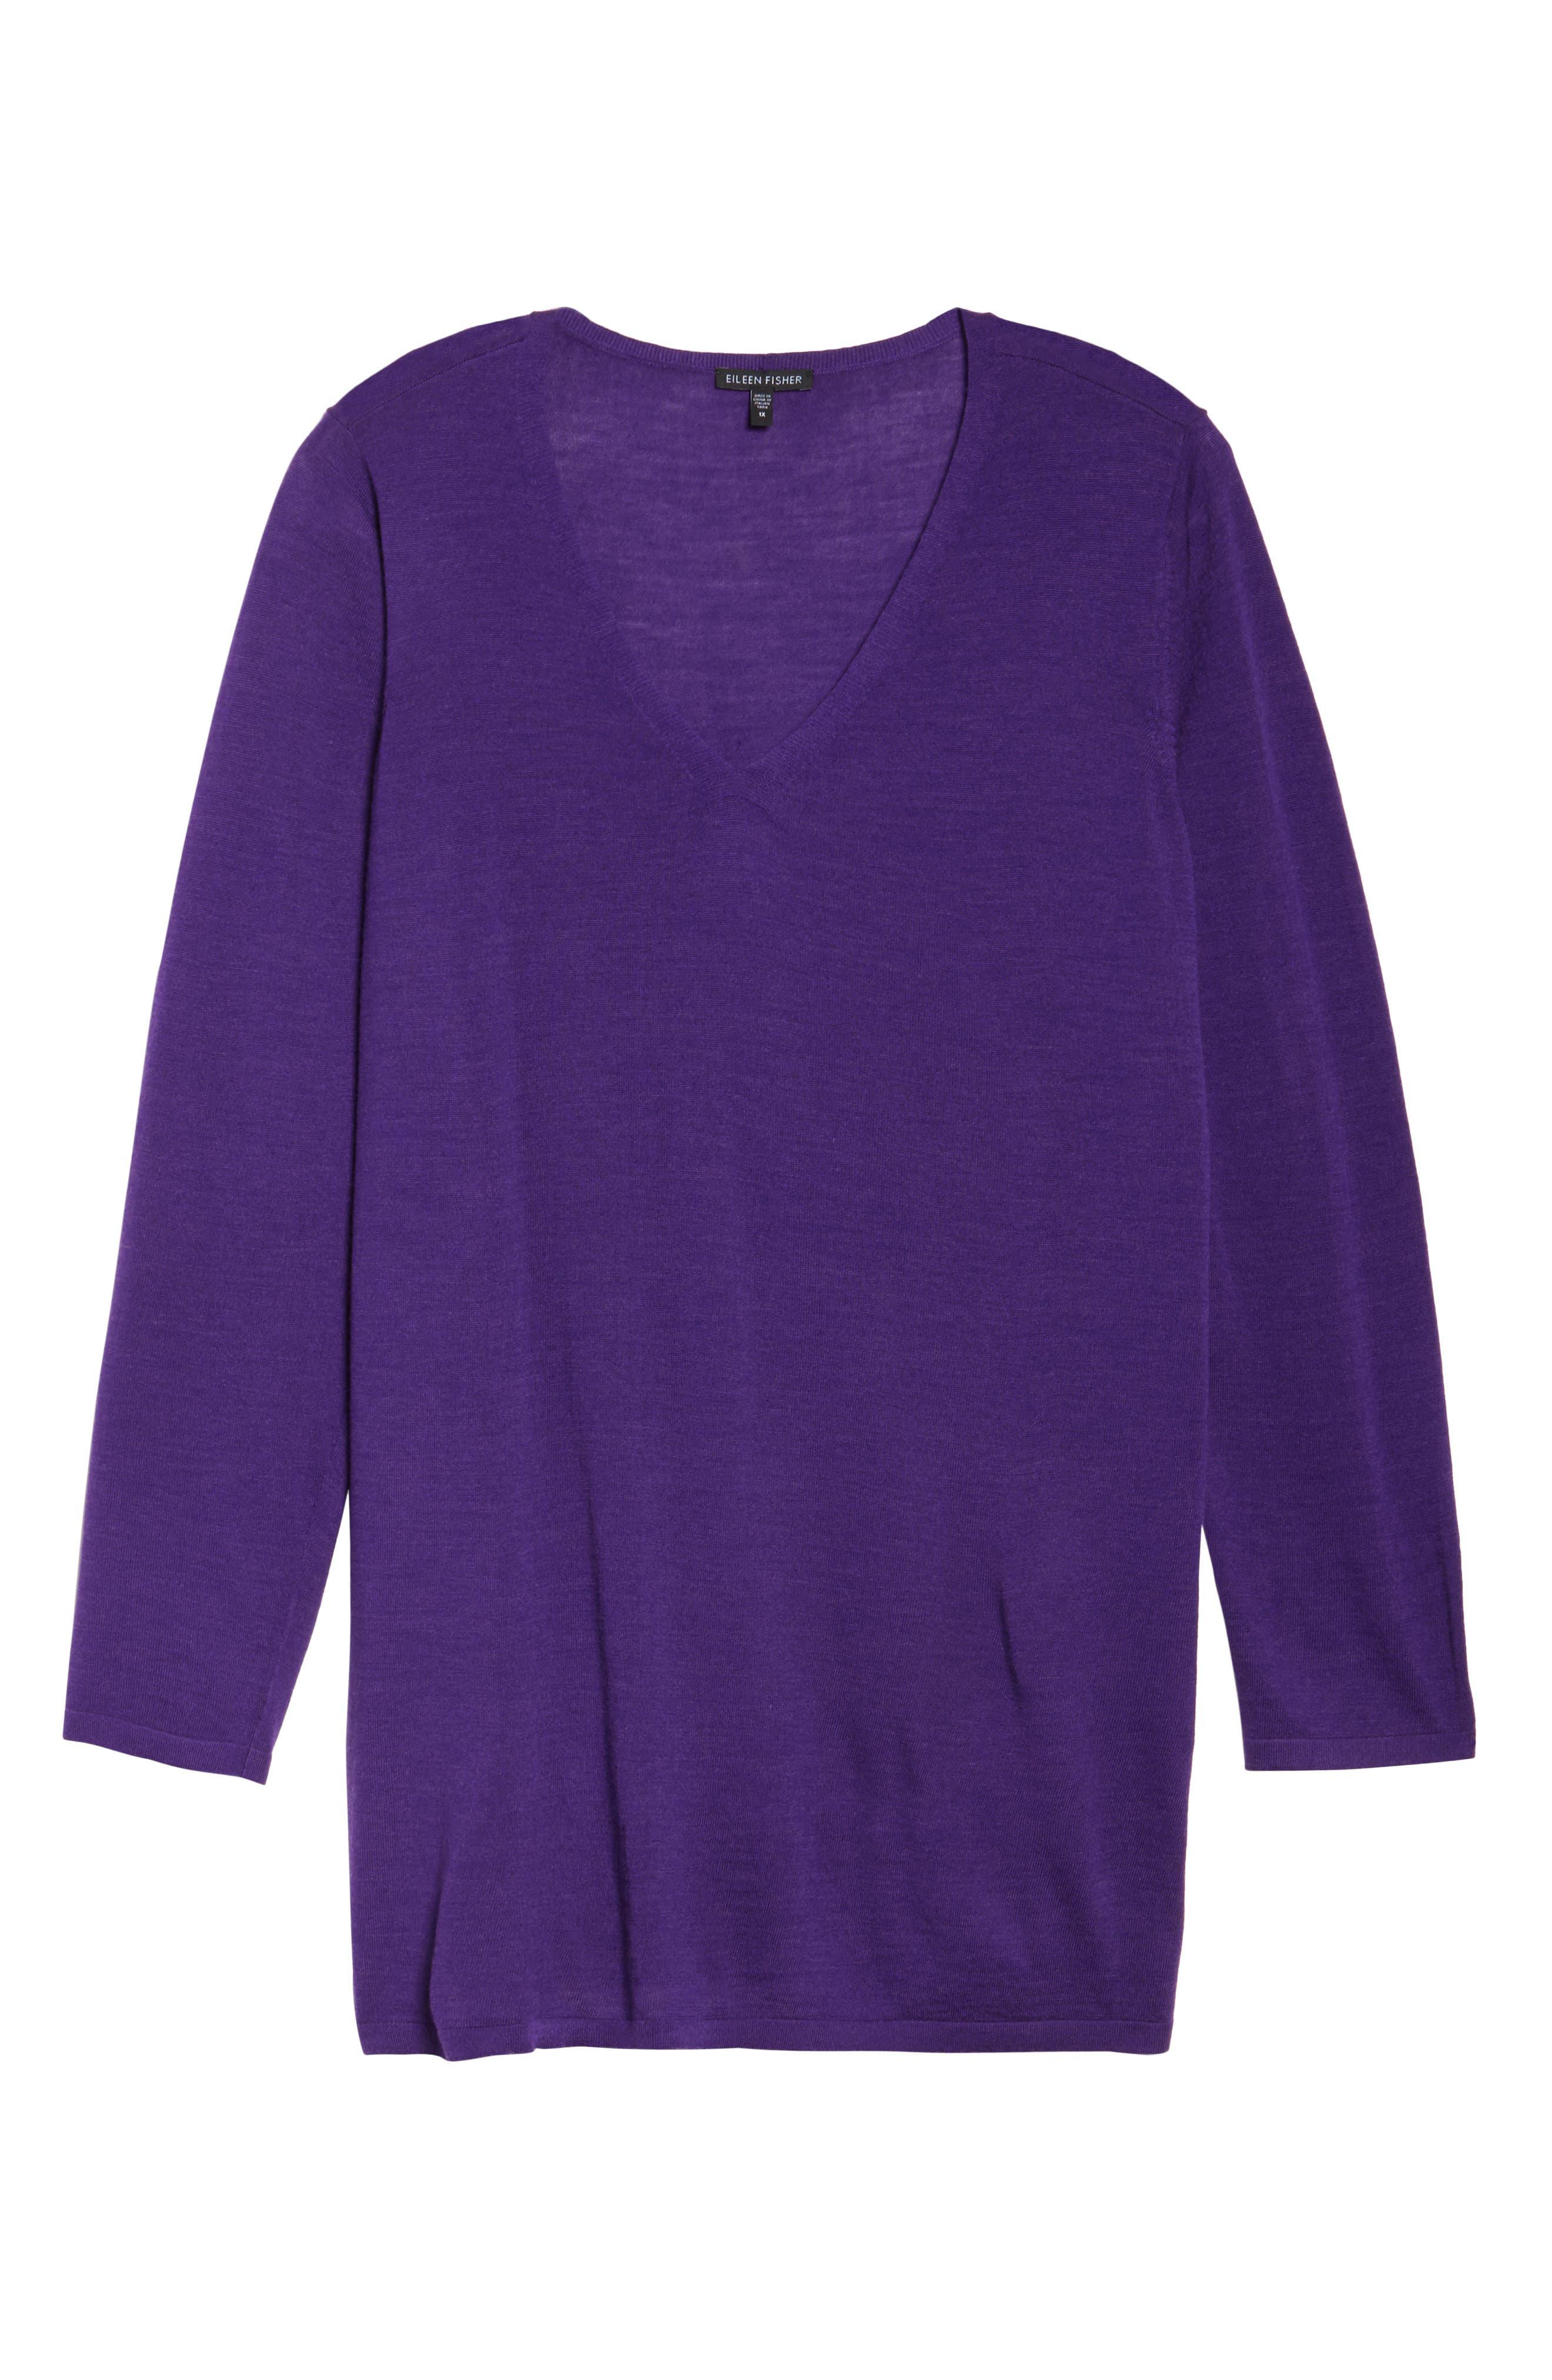 Merino Wool Tunic Sweater,                             Alternate thumbnail 6, color,                             Ultraviolet